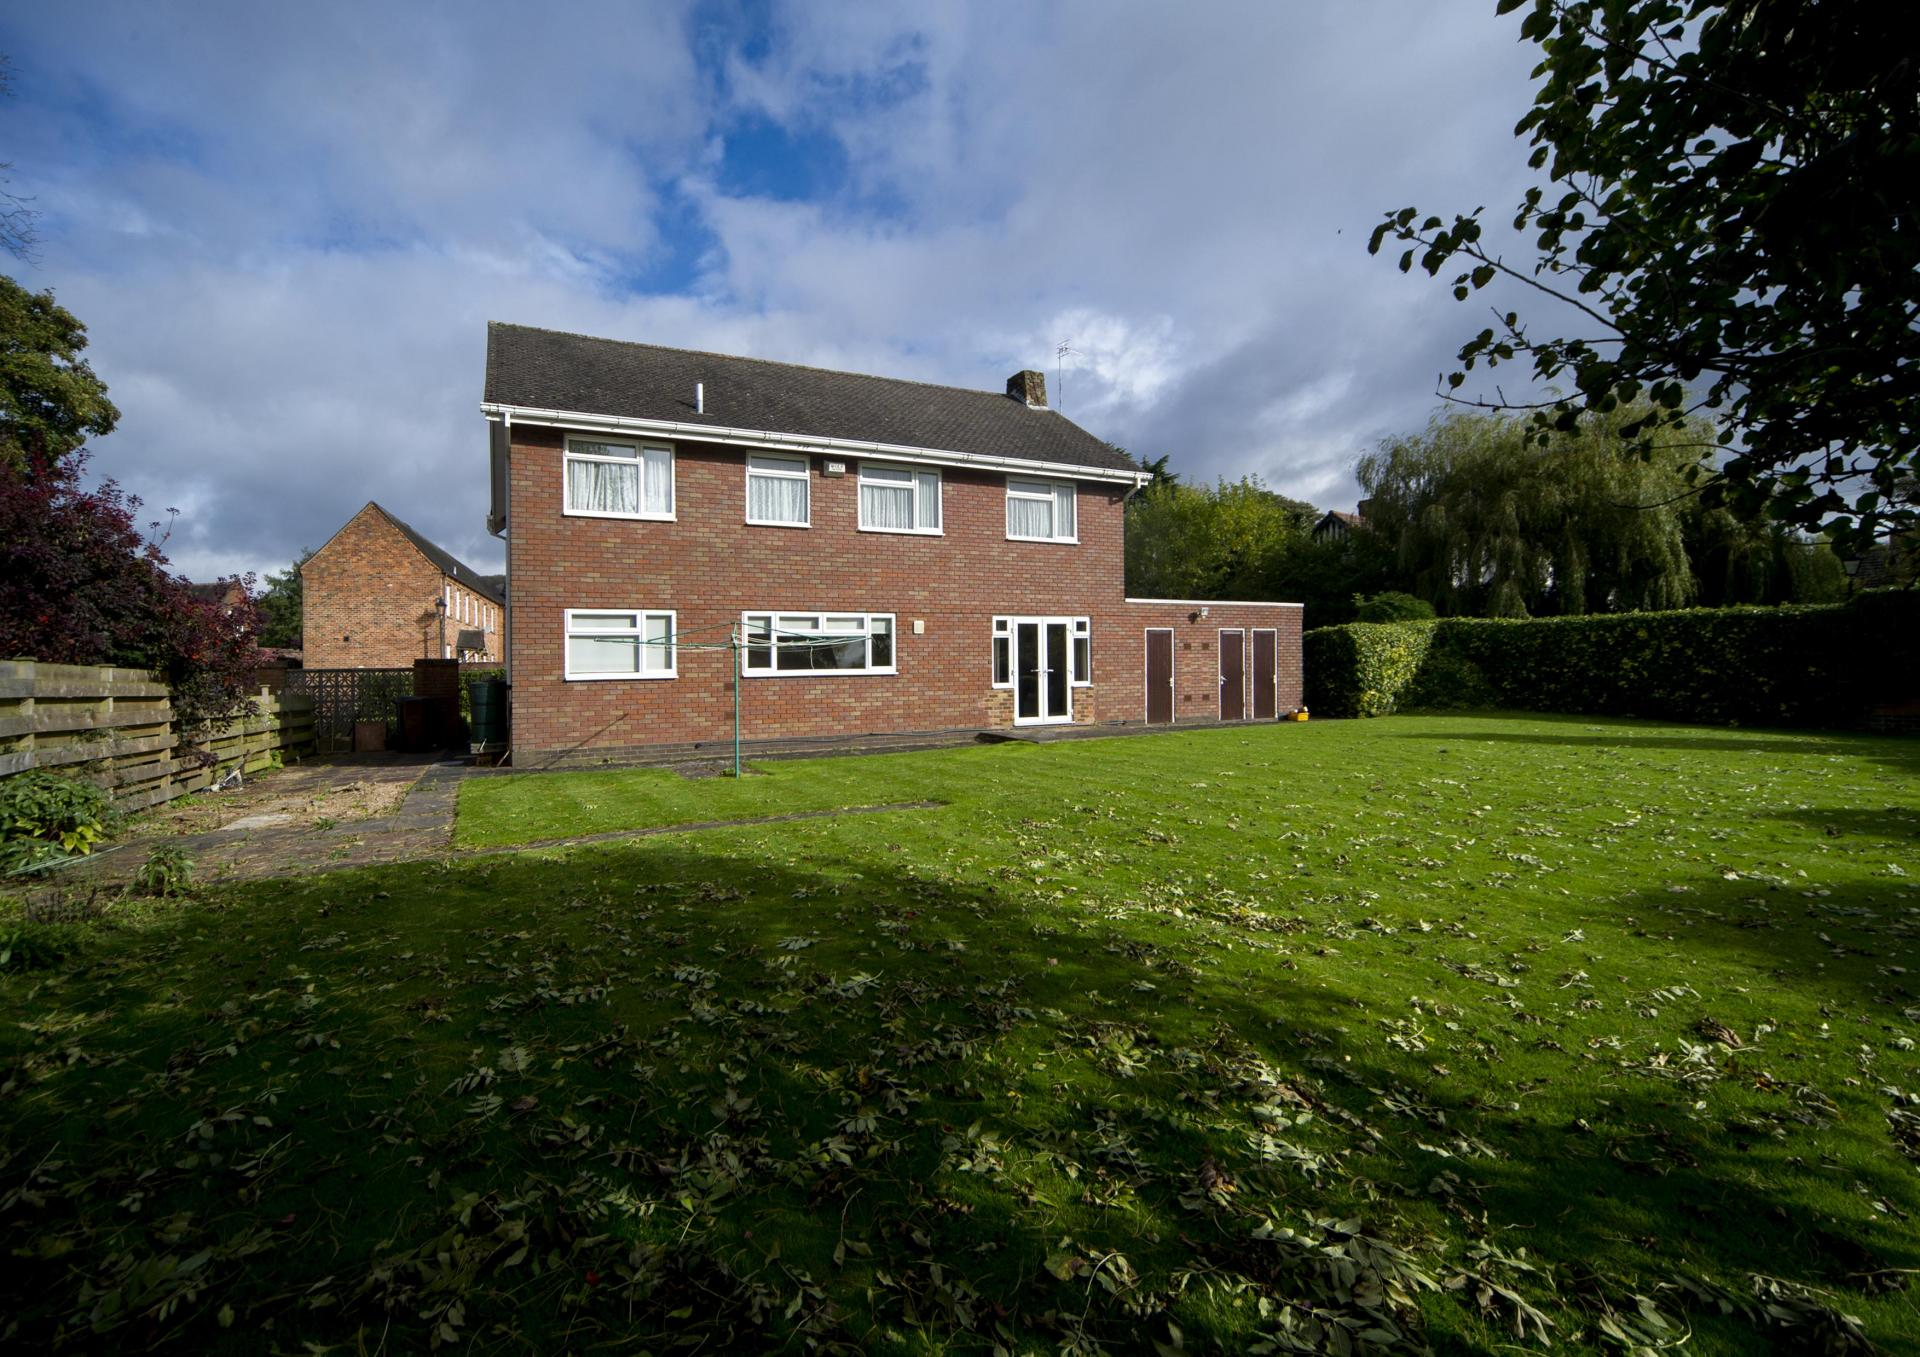 Property For Sale On Penn Road Wolverhampton